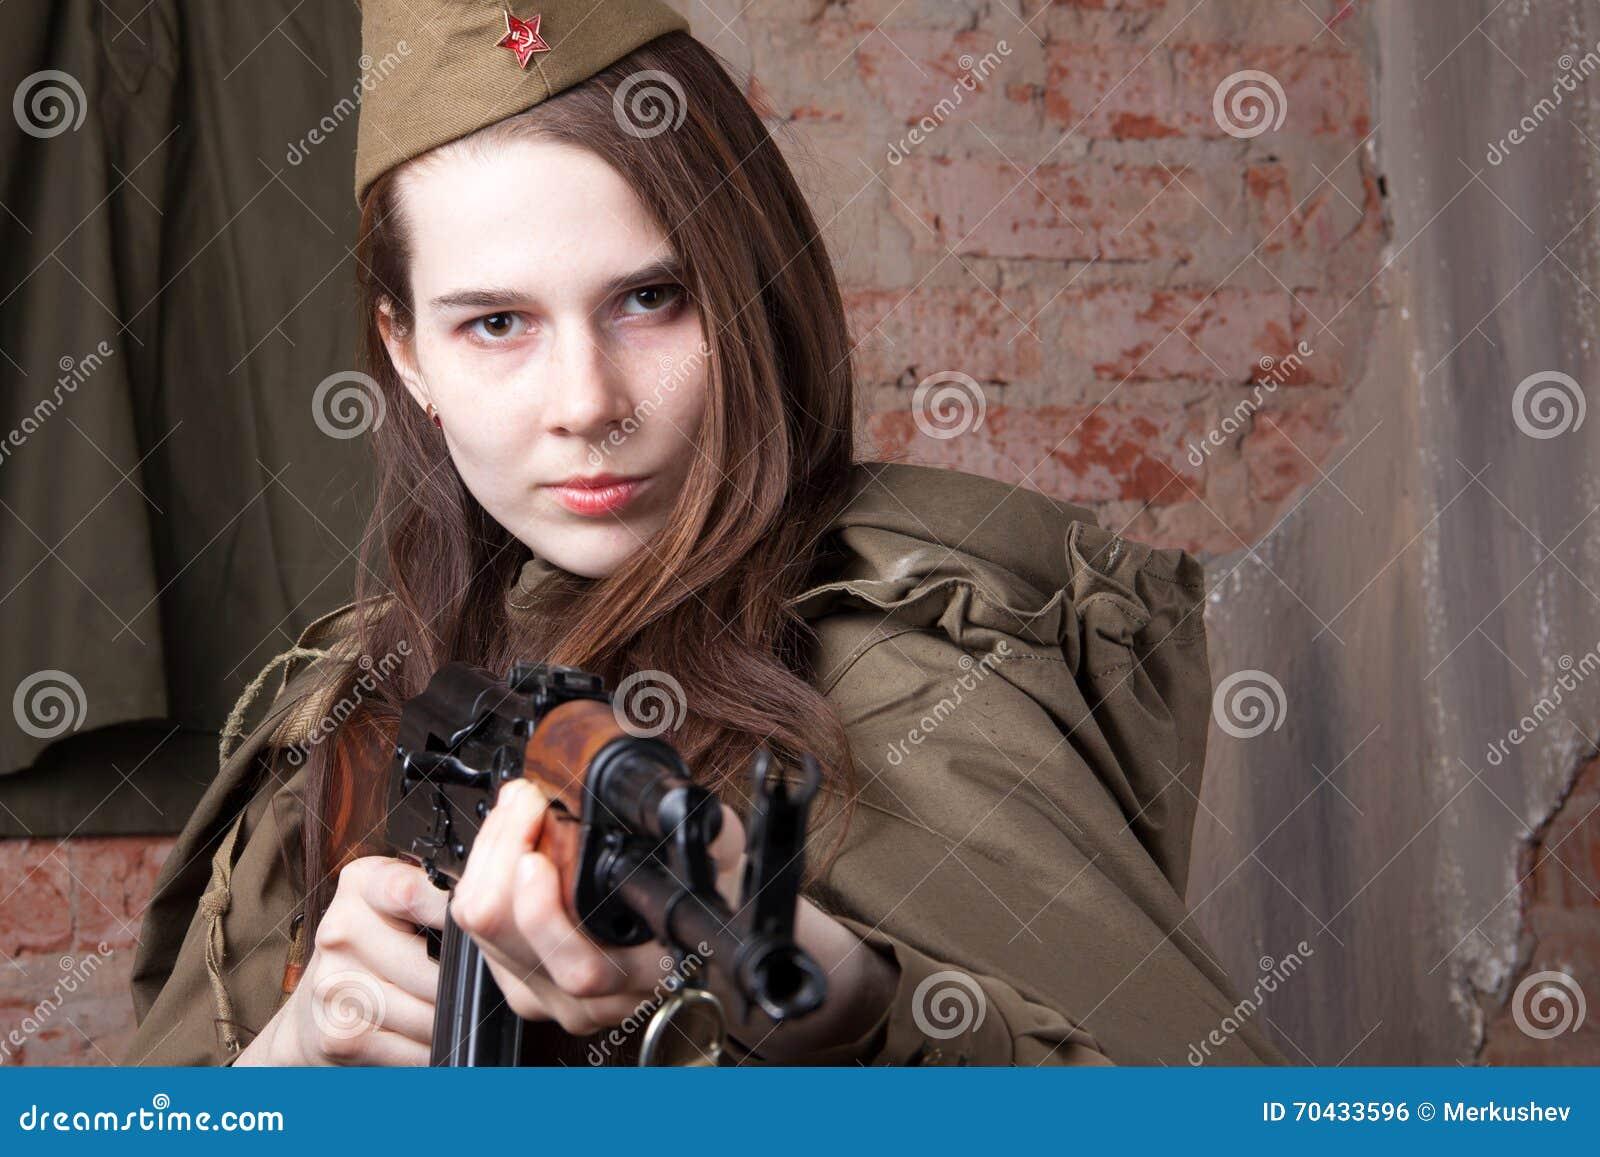 La femme Russe pendant la guerre - elena dementieva